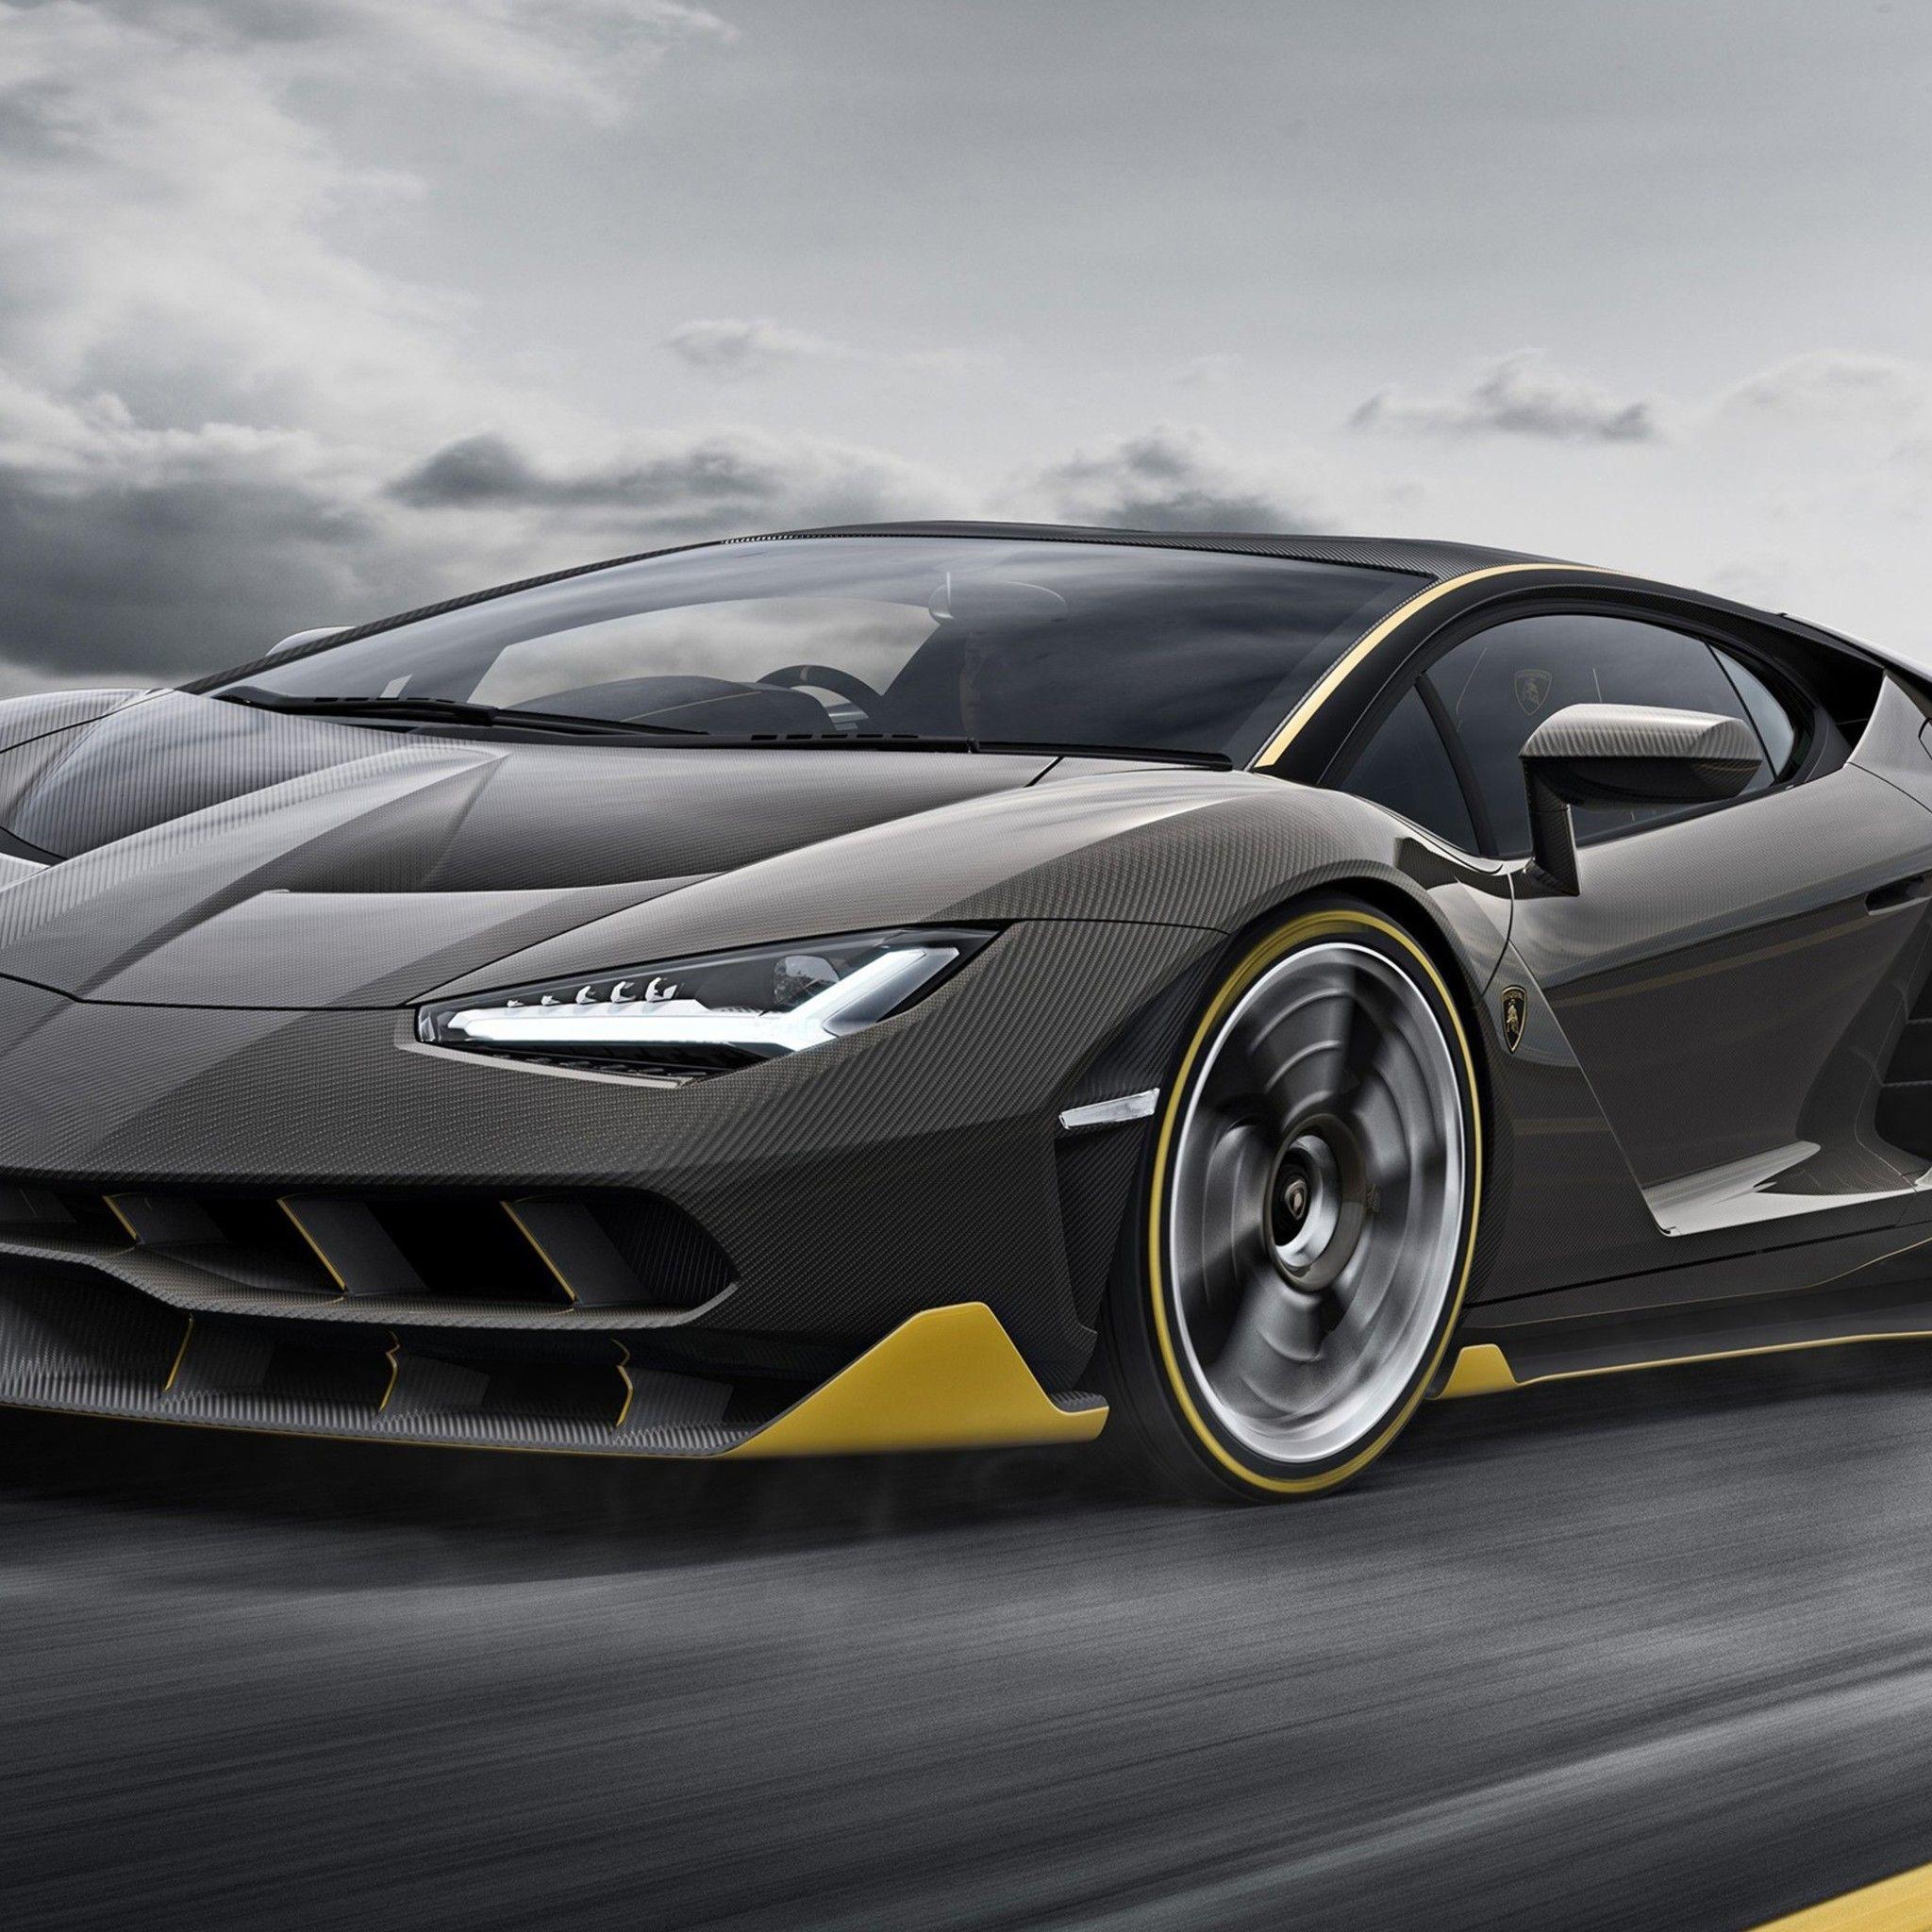 Lamborghini Centenario Wallpapers